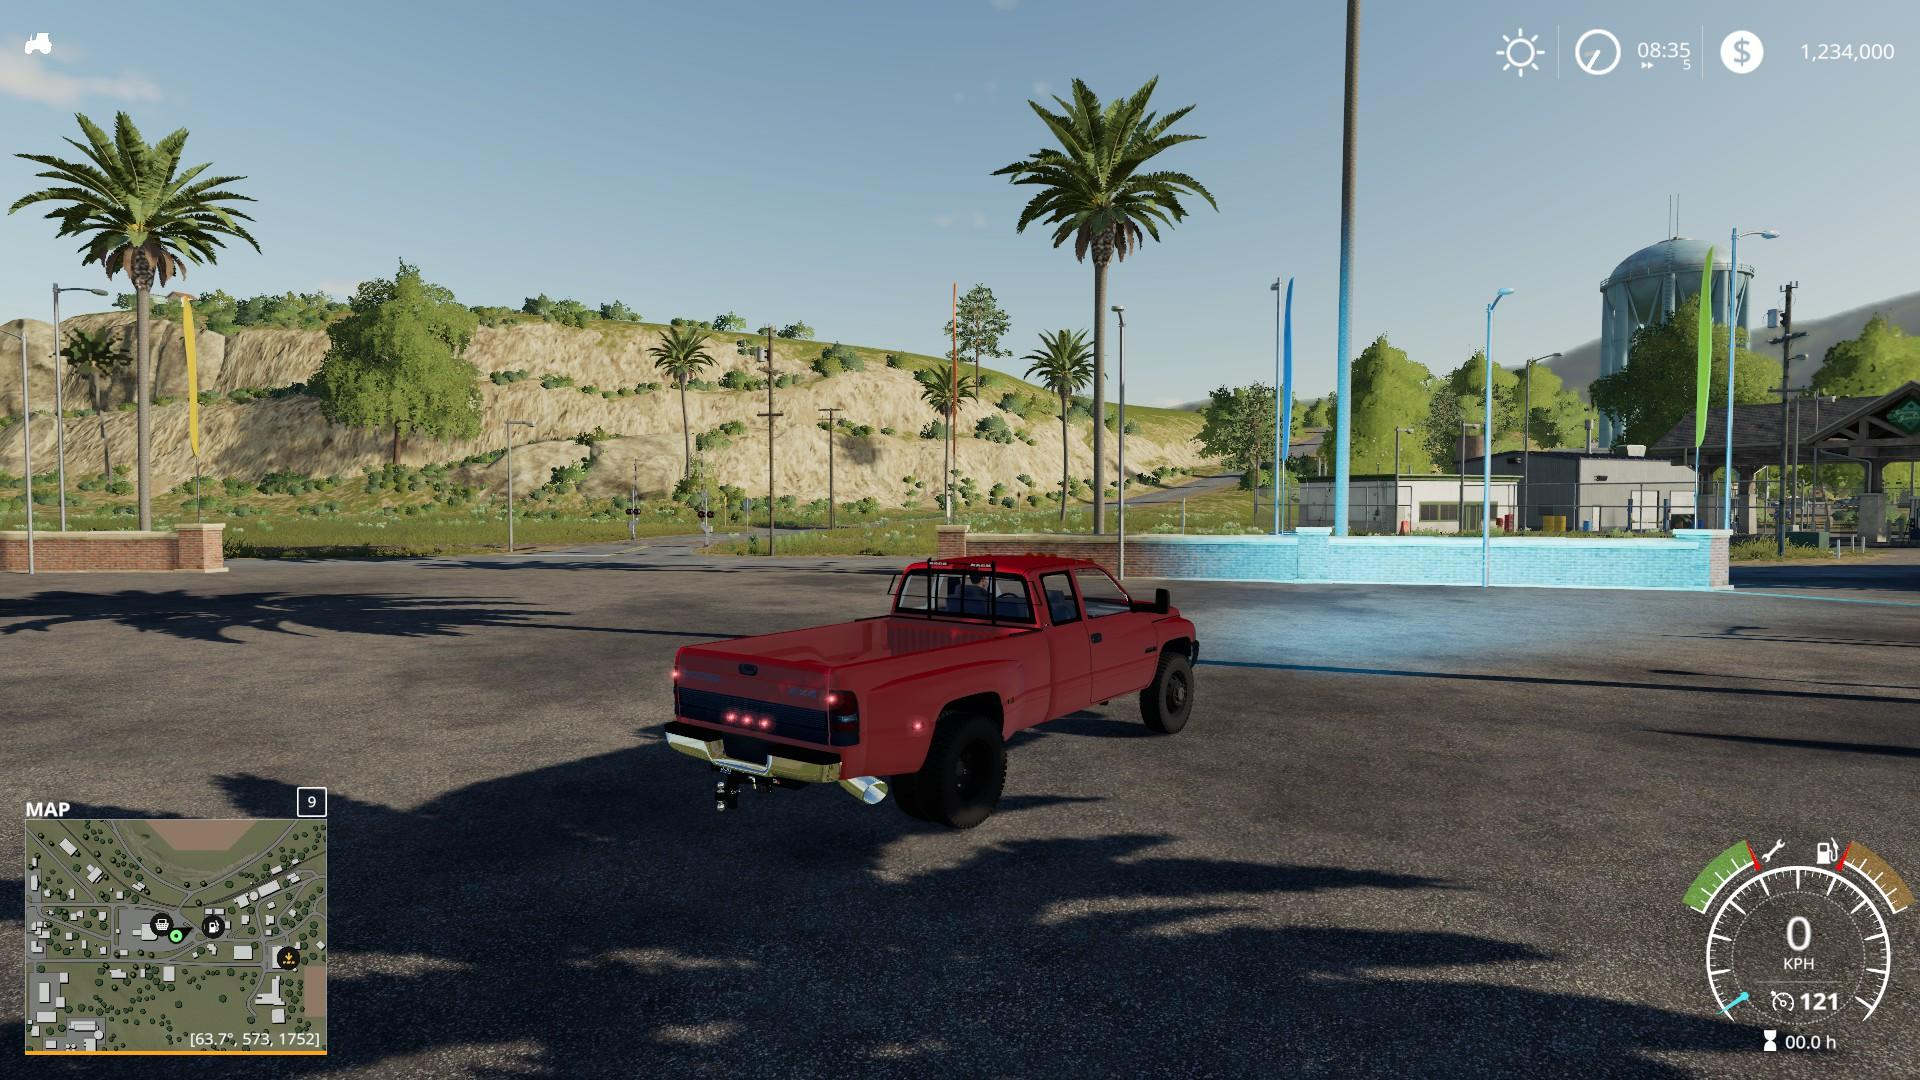 2nd gen Dodge Ram 3500 v1 0 FS19 - Farming Simulator 19 Mod | FS19 mod